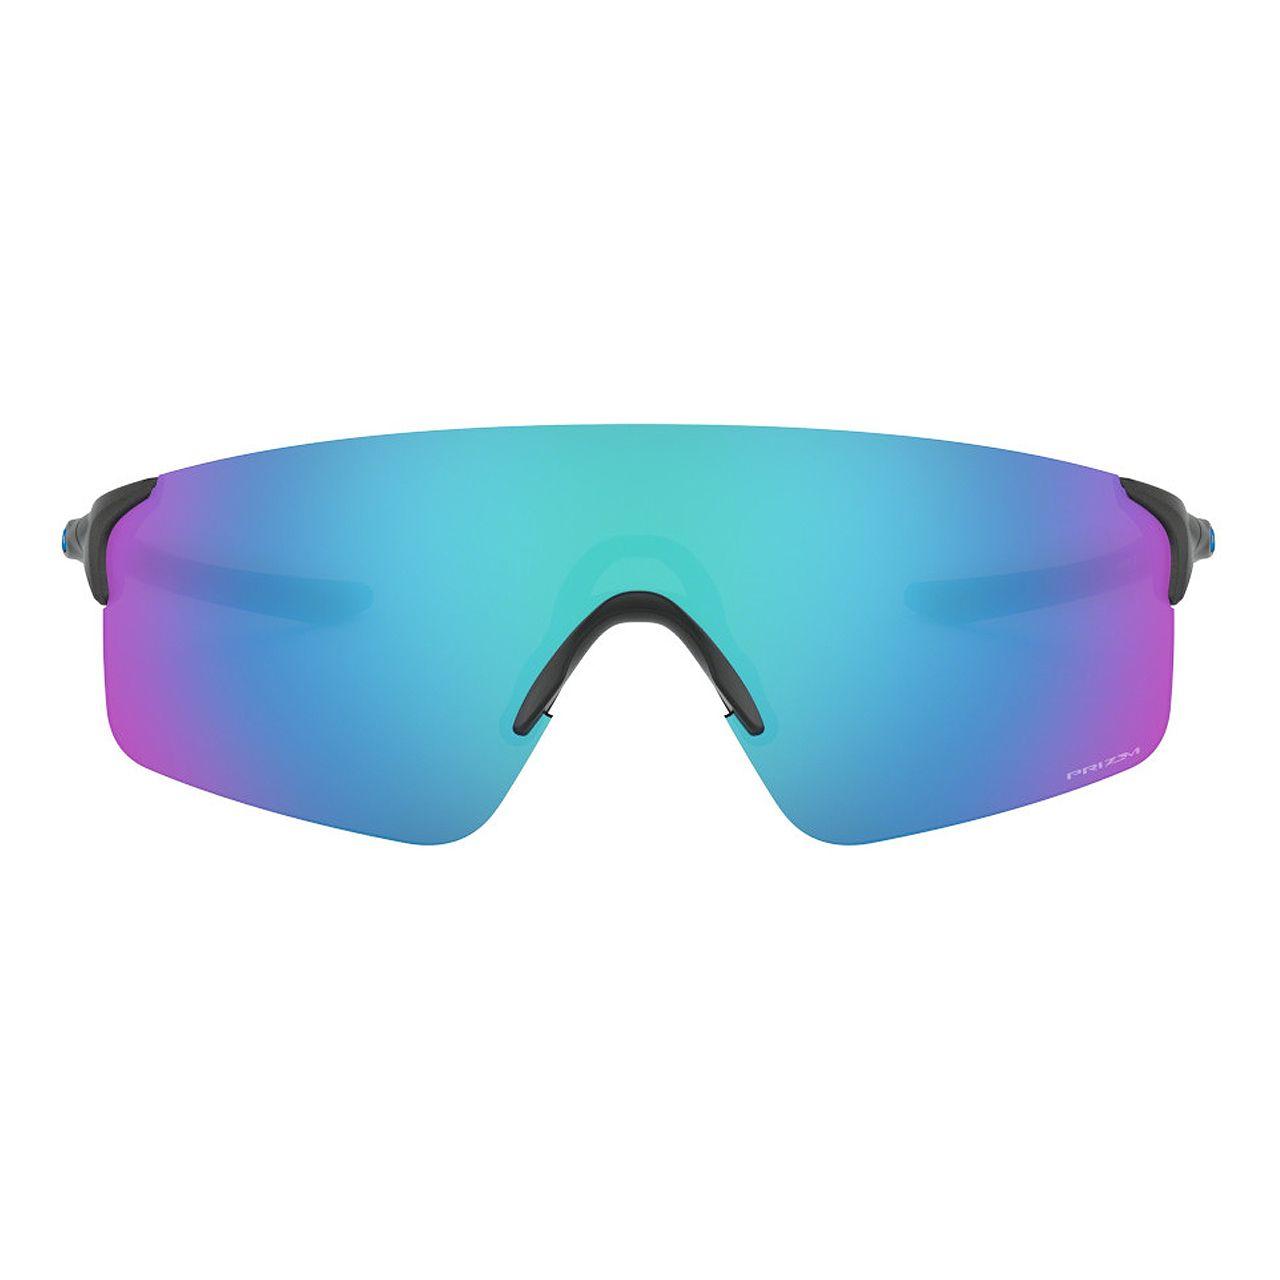 عینک آفتابی اوکلی مدل EVZero Blades کد OO9454-0338